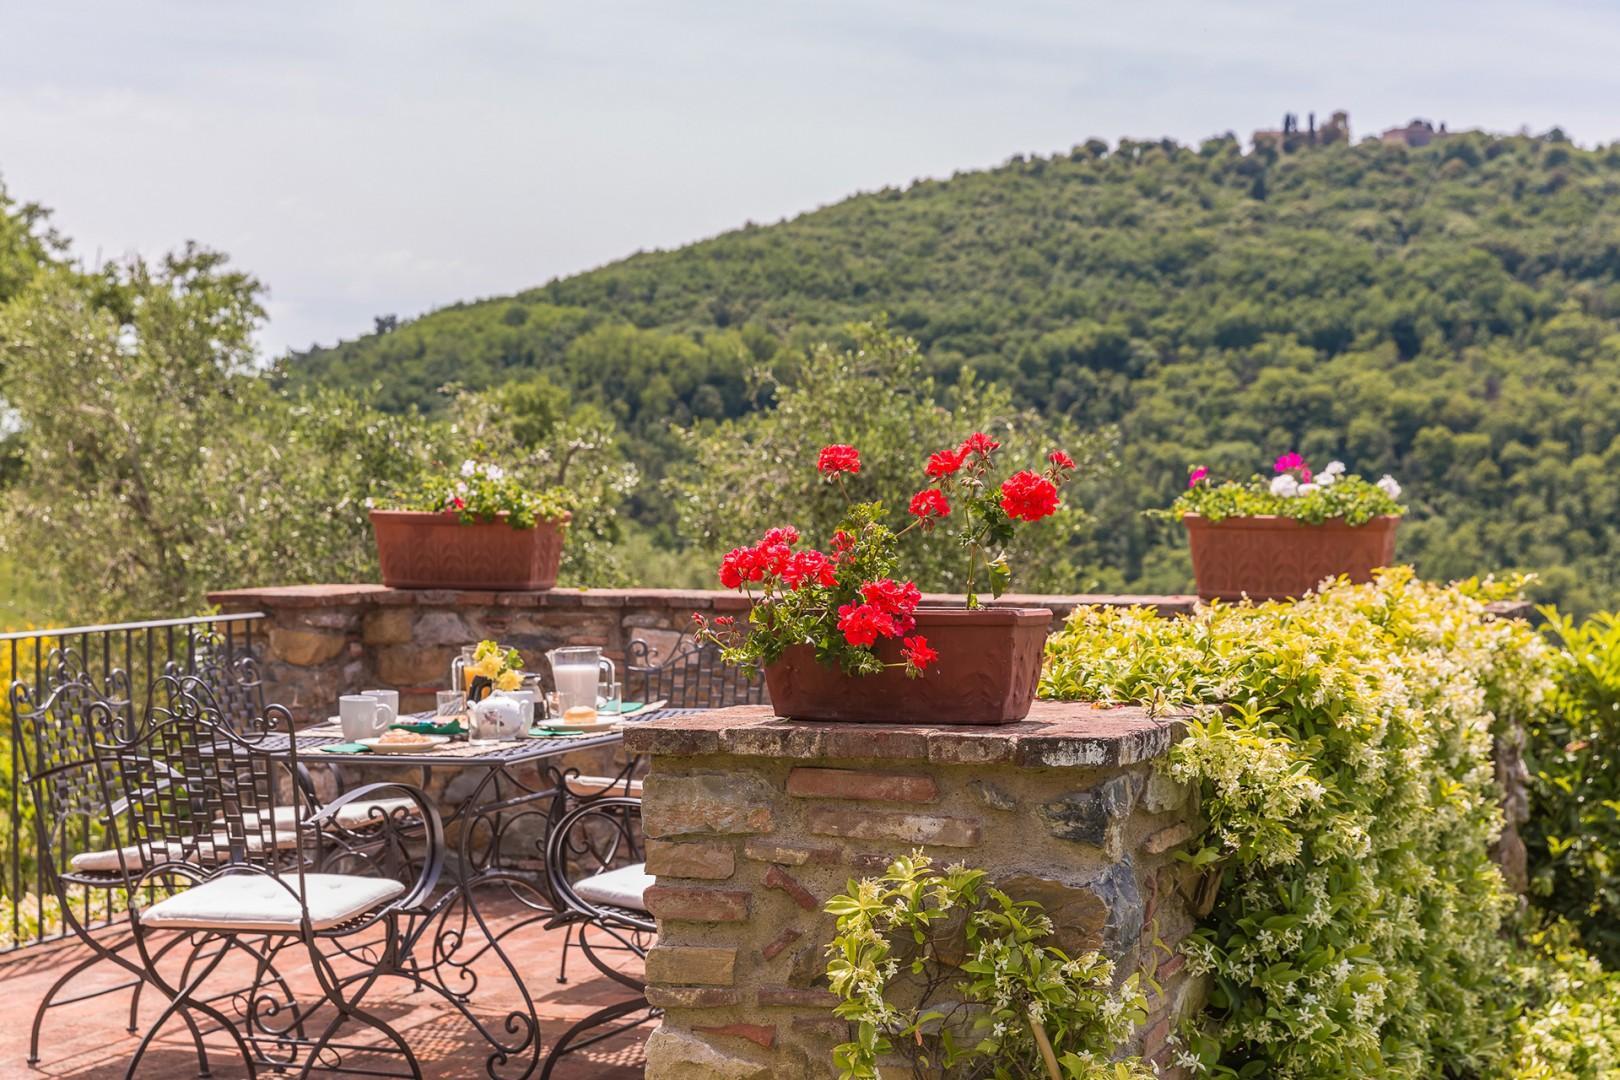 Views of Monsummano Alto from the table.